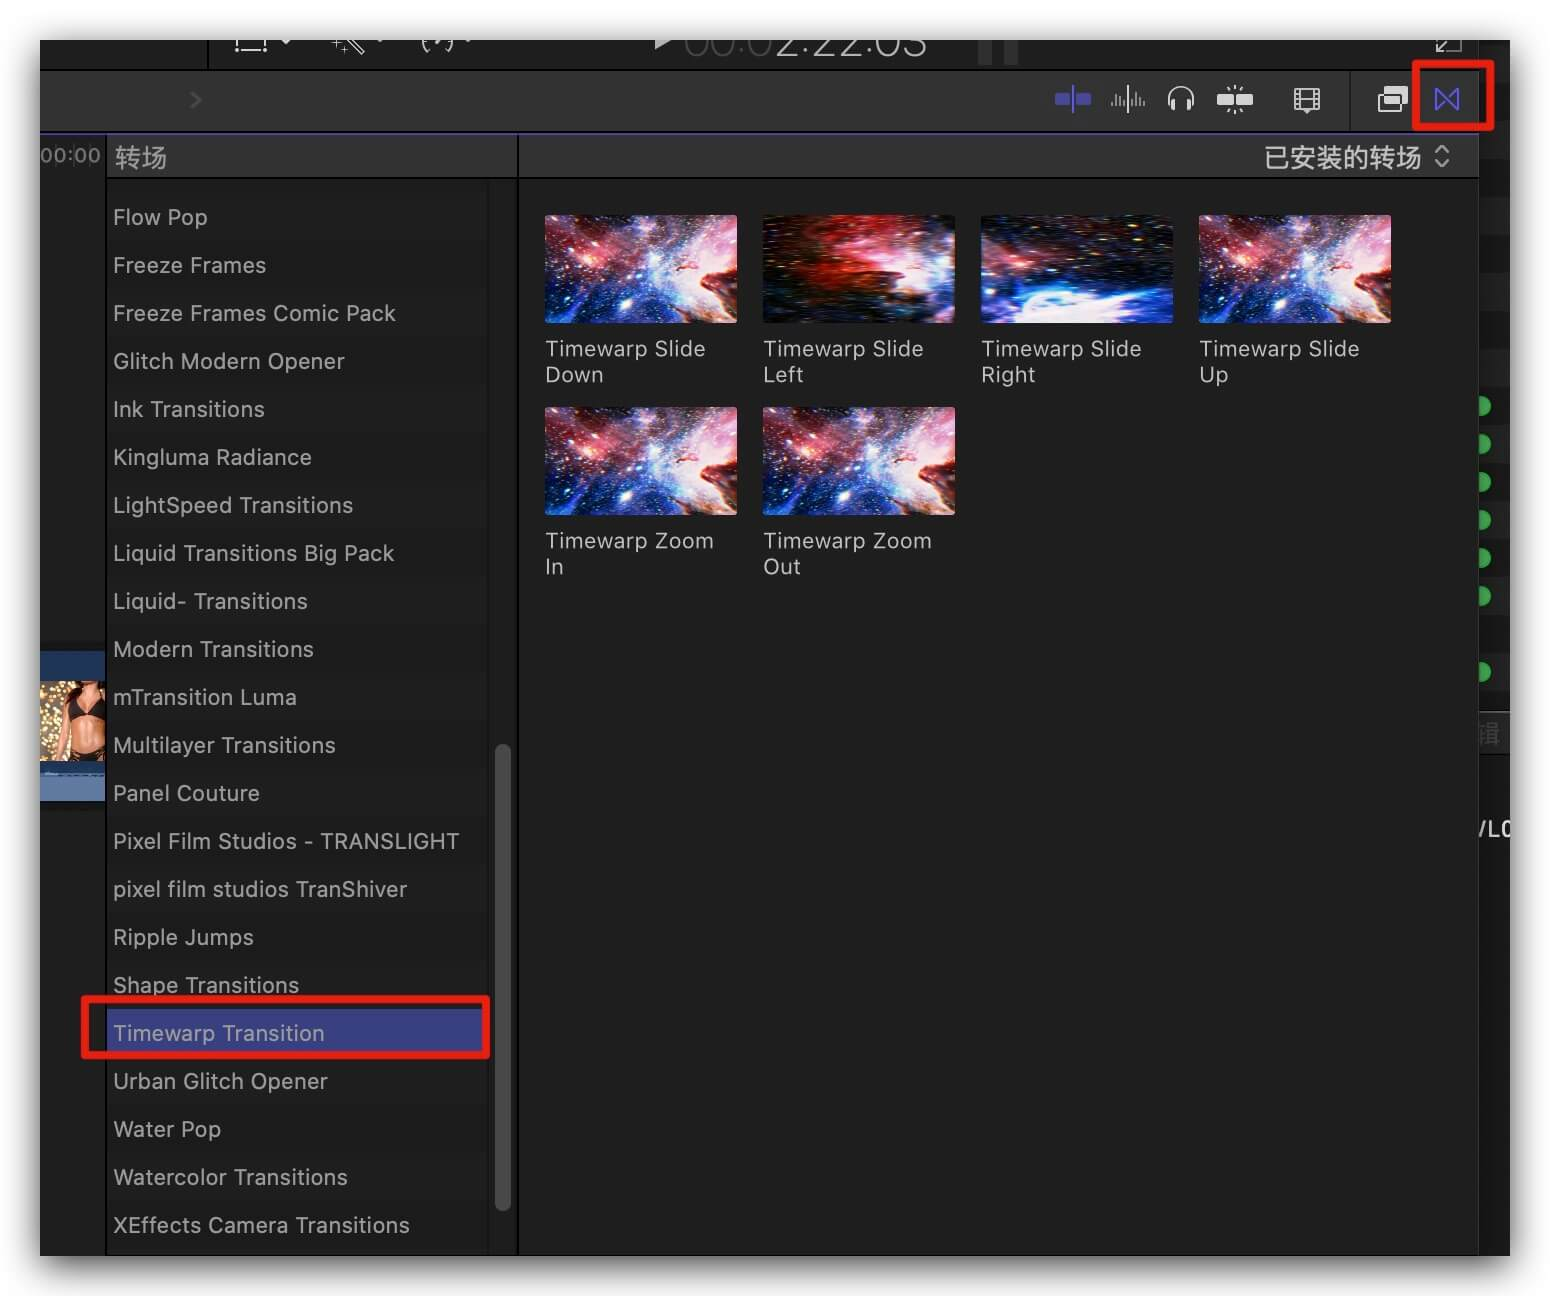 Fcpx插件 6组时间扭曲视频过渡转场预设 完整版 Timewarp Transition